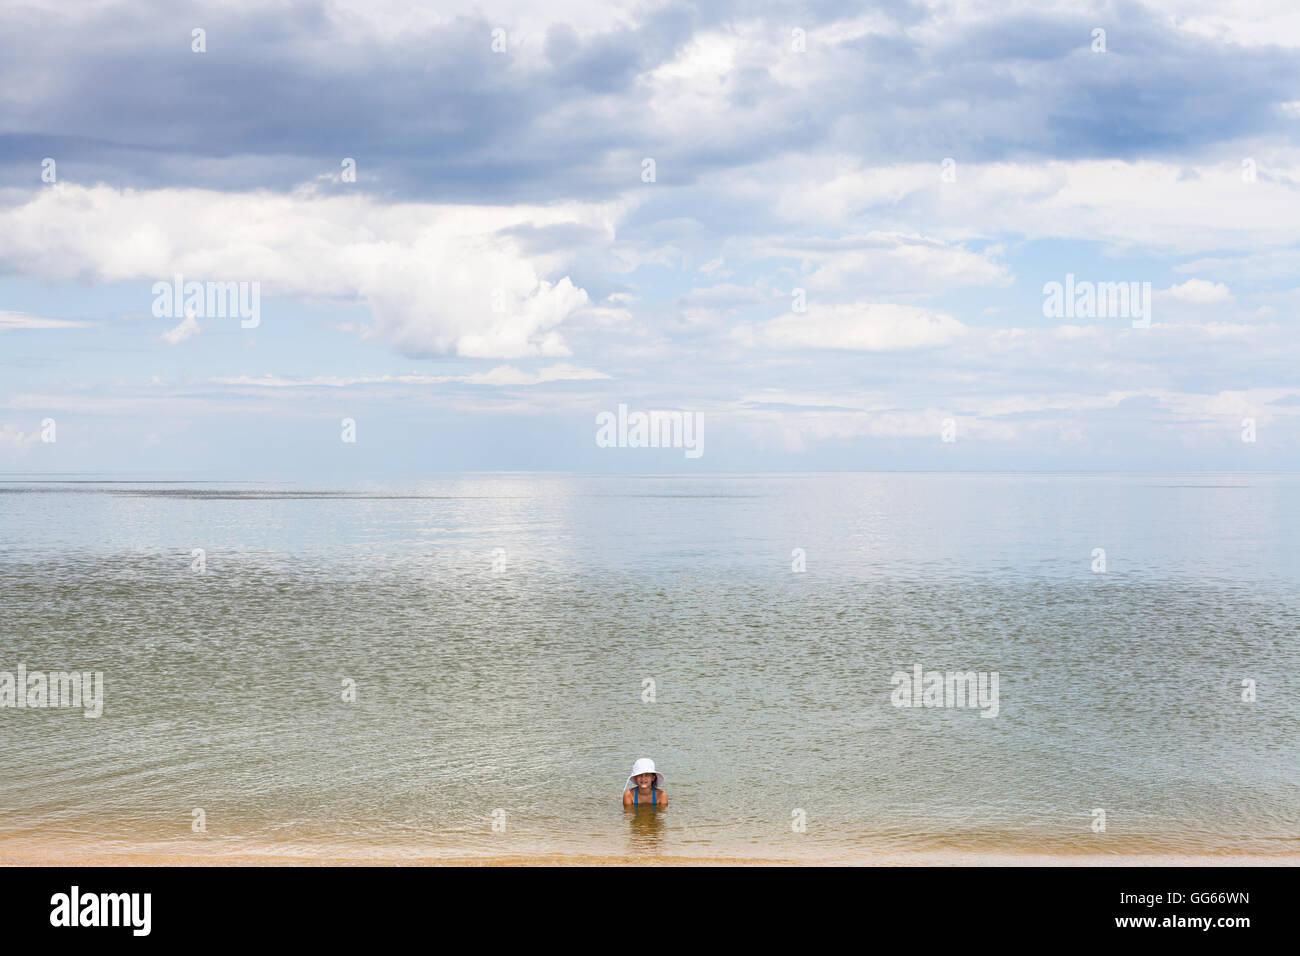 Who is relaxing in Golubitskaya 54